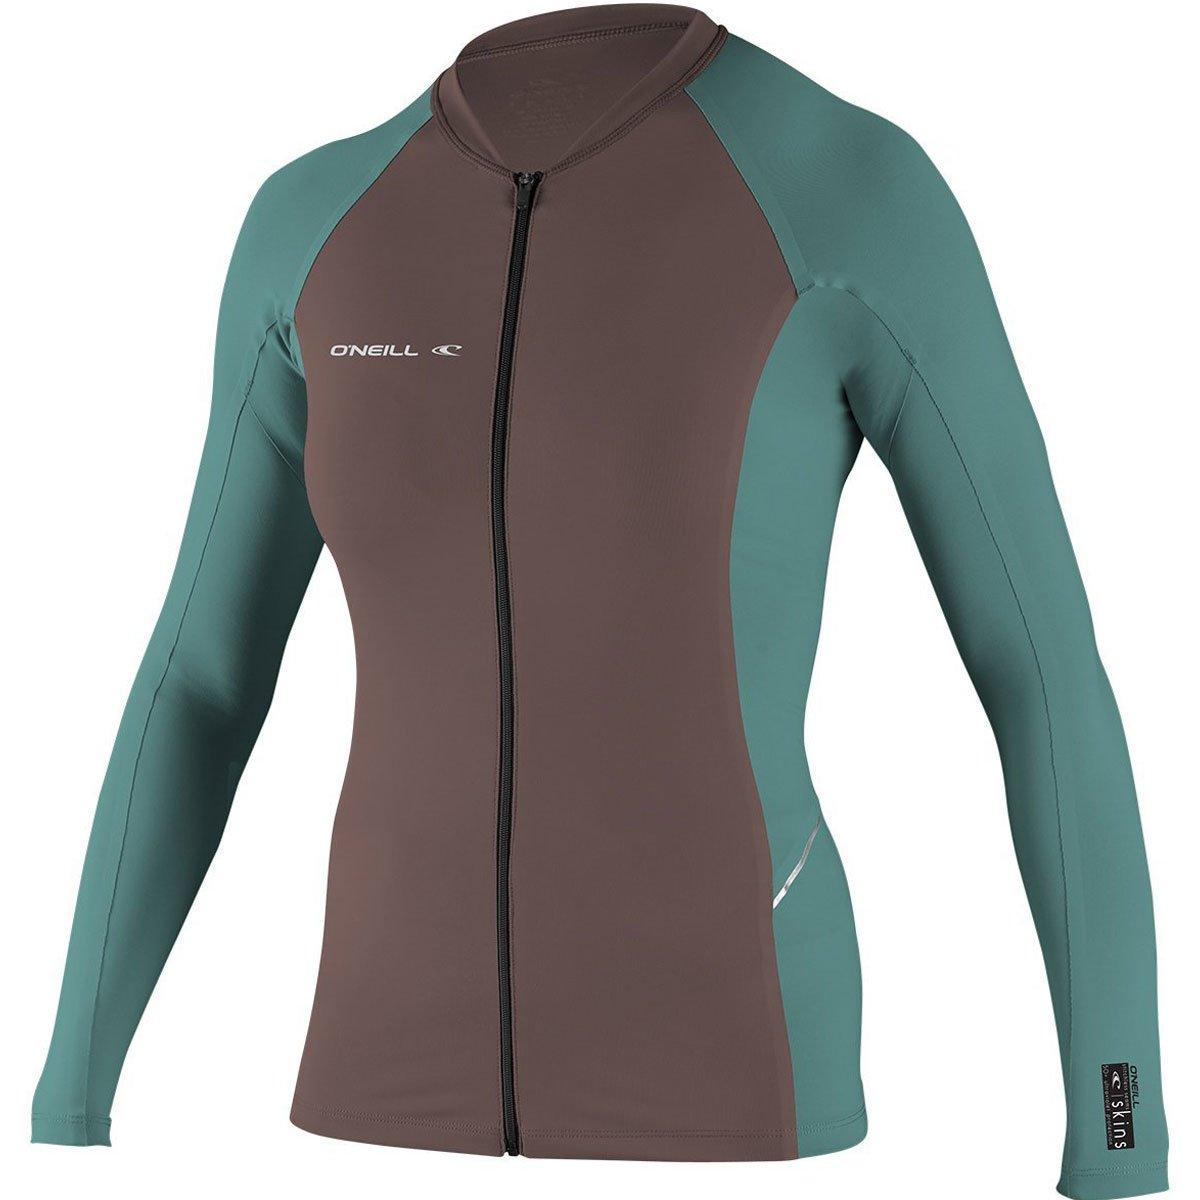 O'Neill Women's Premium Skins Stitchless UPF 50+ Long Sleeve Full Zip Jacket, Pepper/AquaHaze, Small